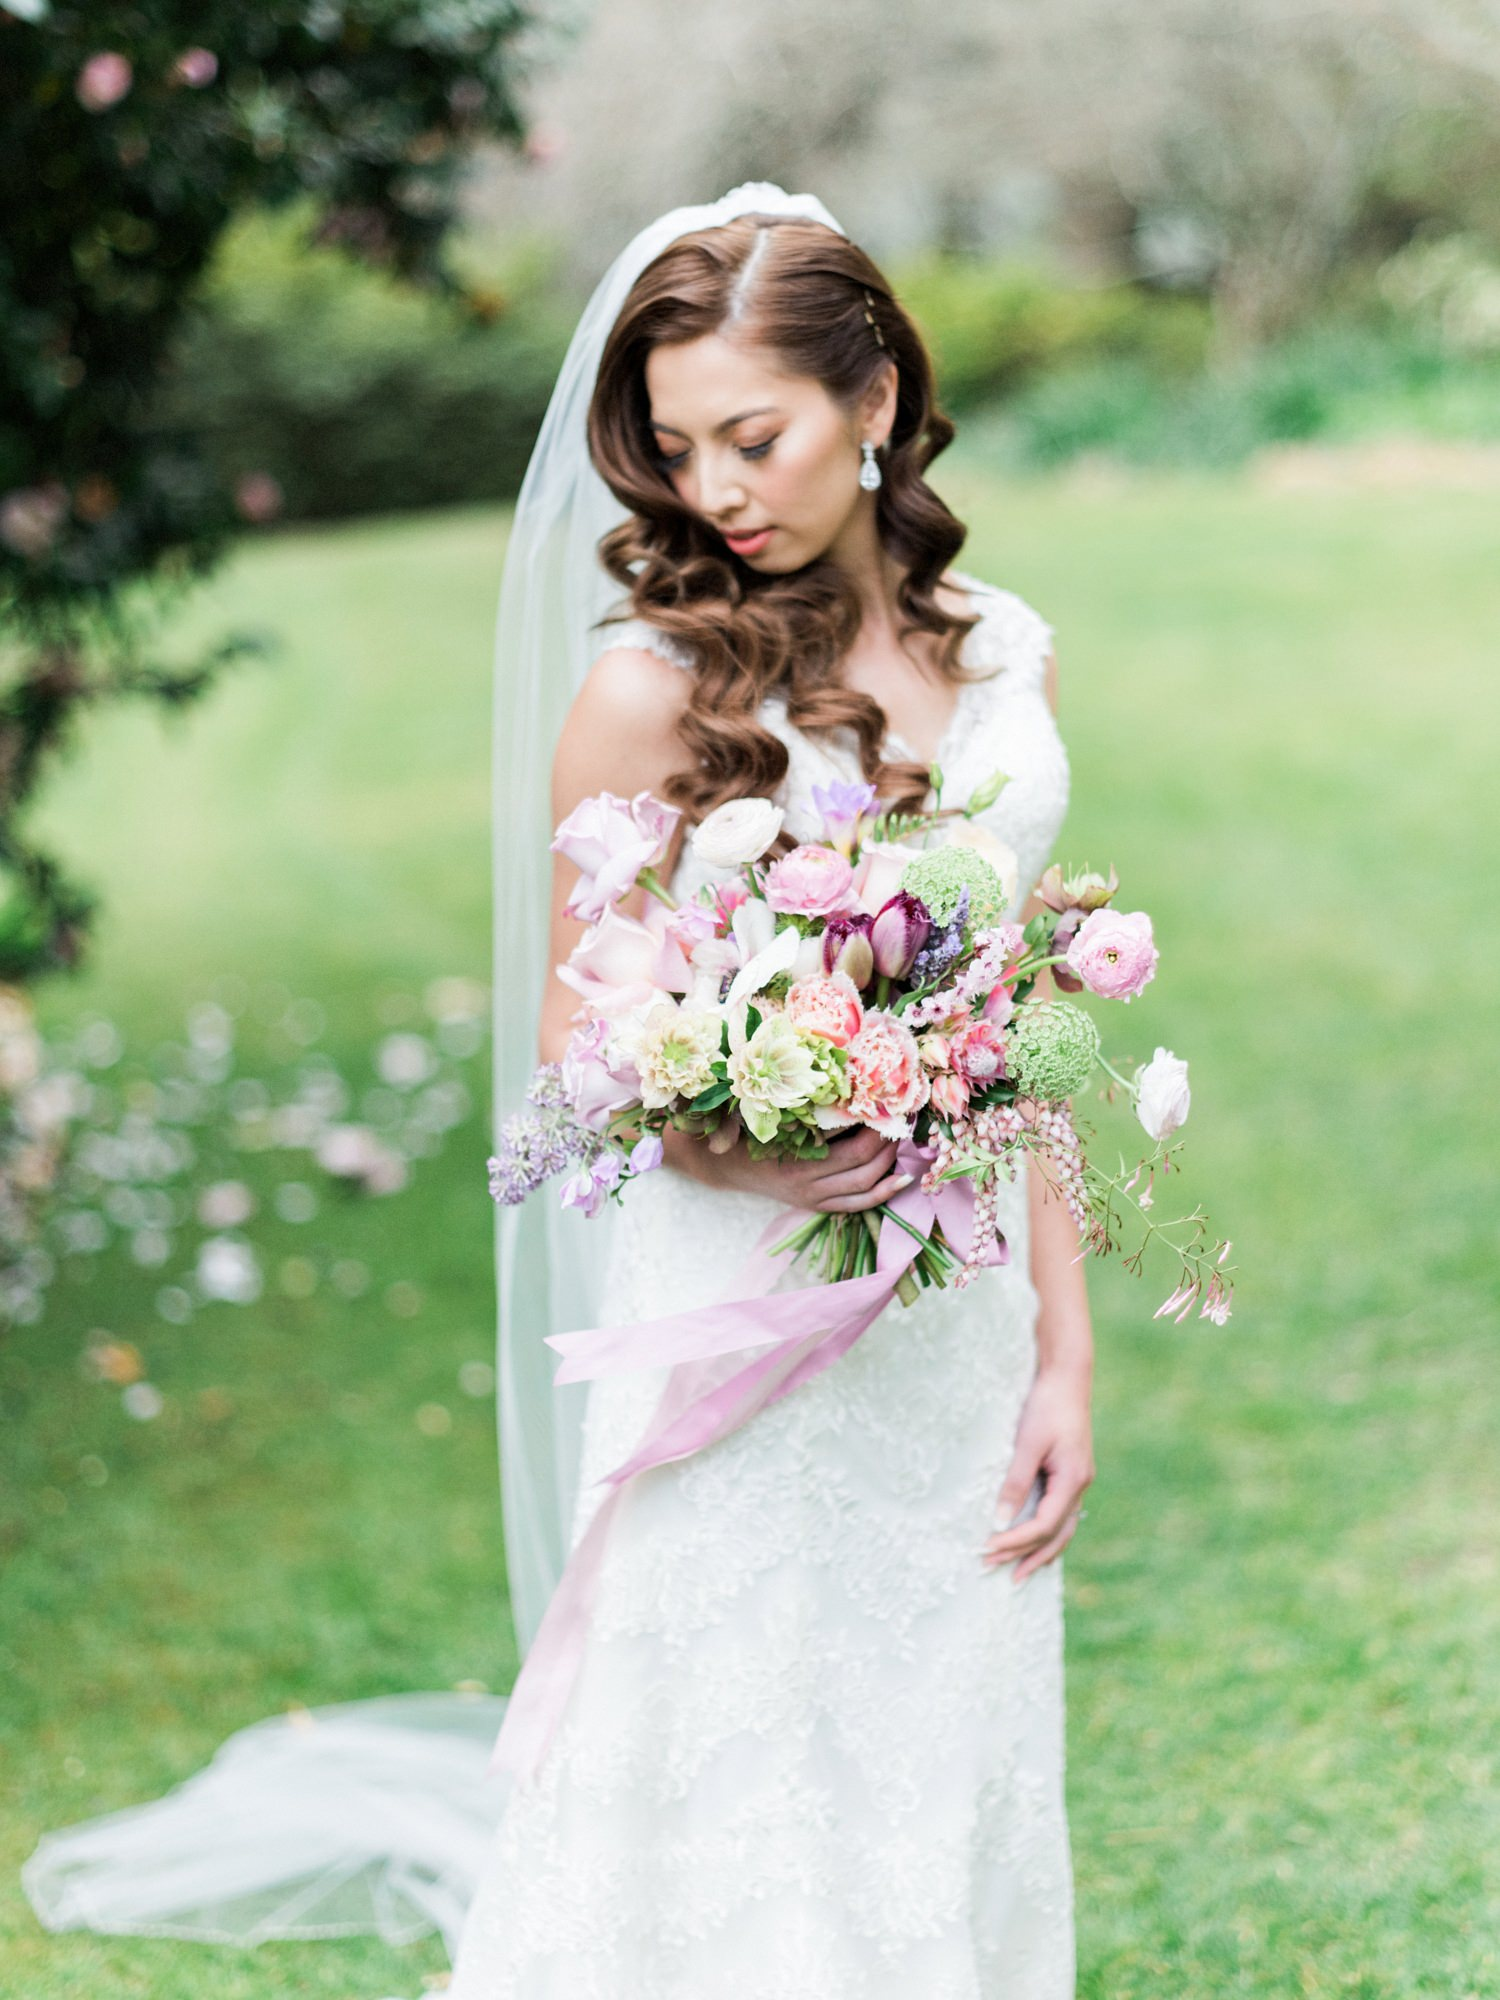 Somphors&dong-wedding-0310.jpg